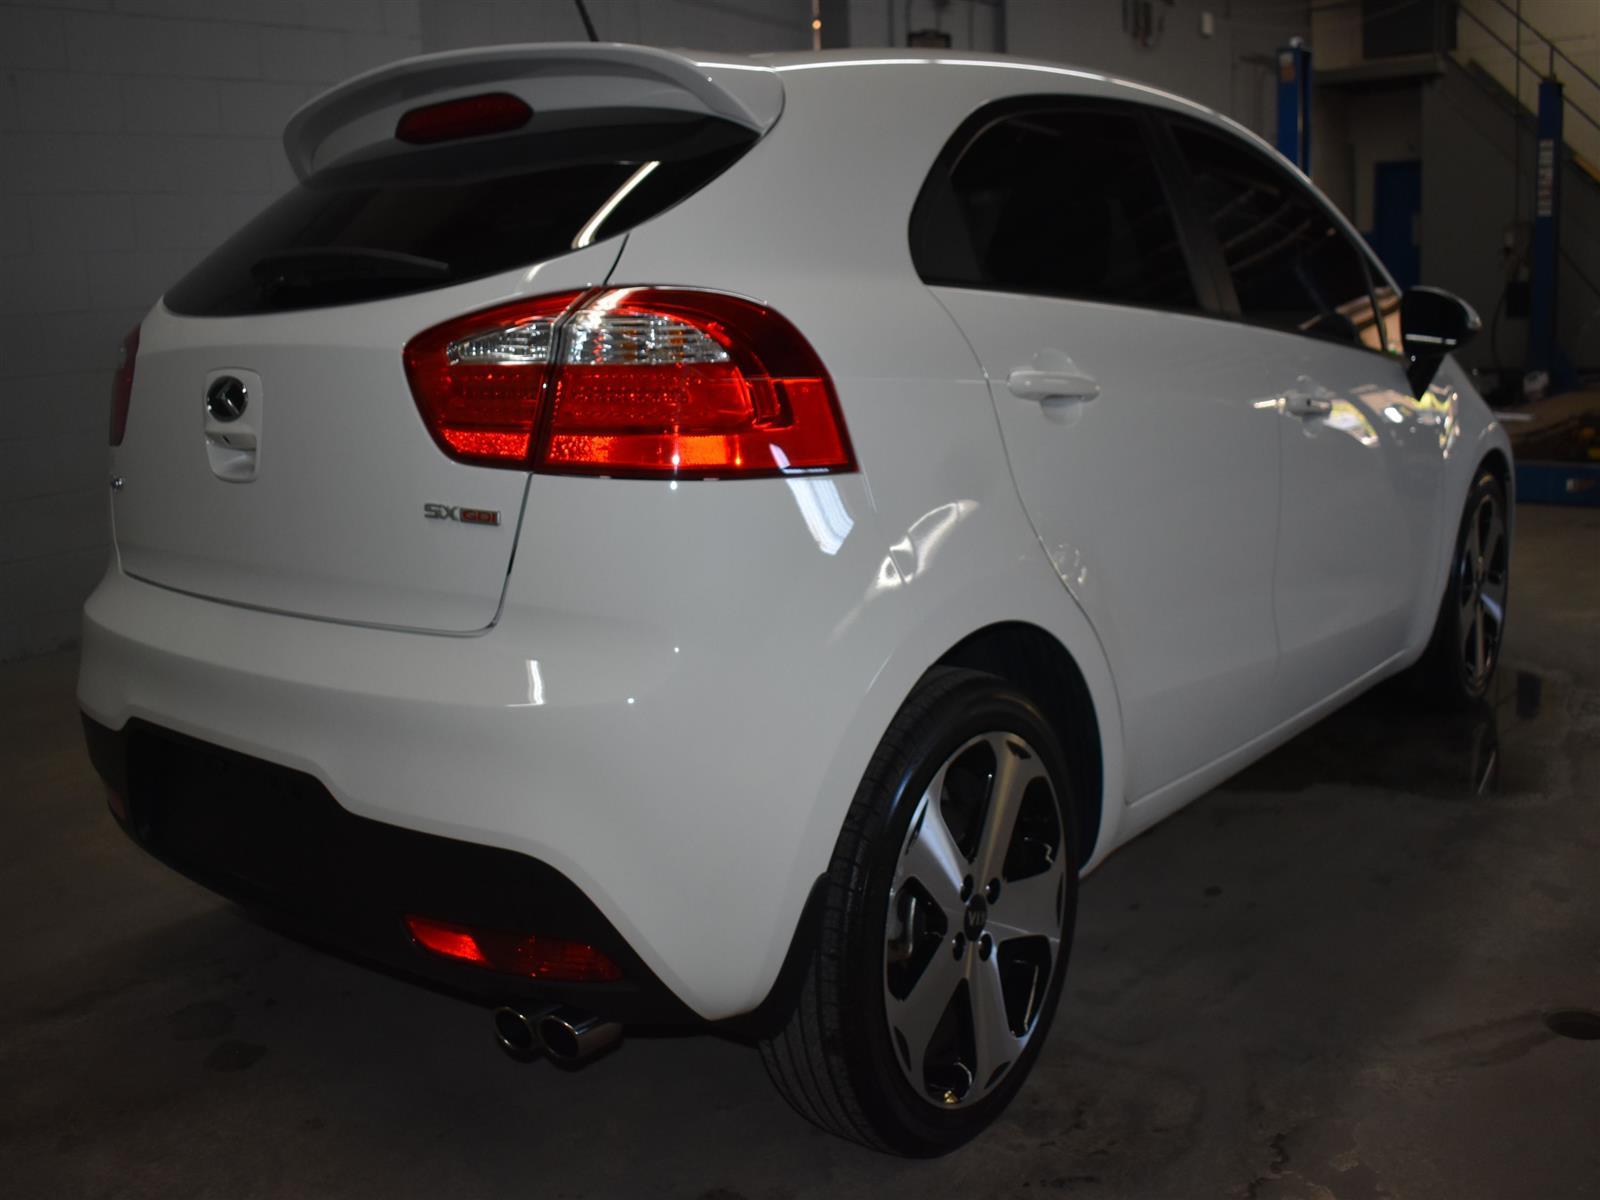 2015 Kia Rio SX